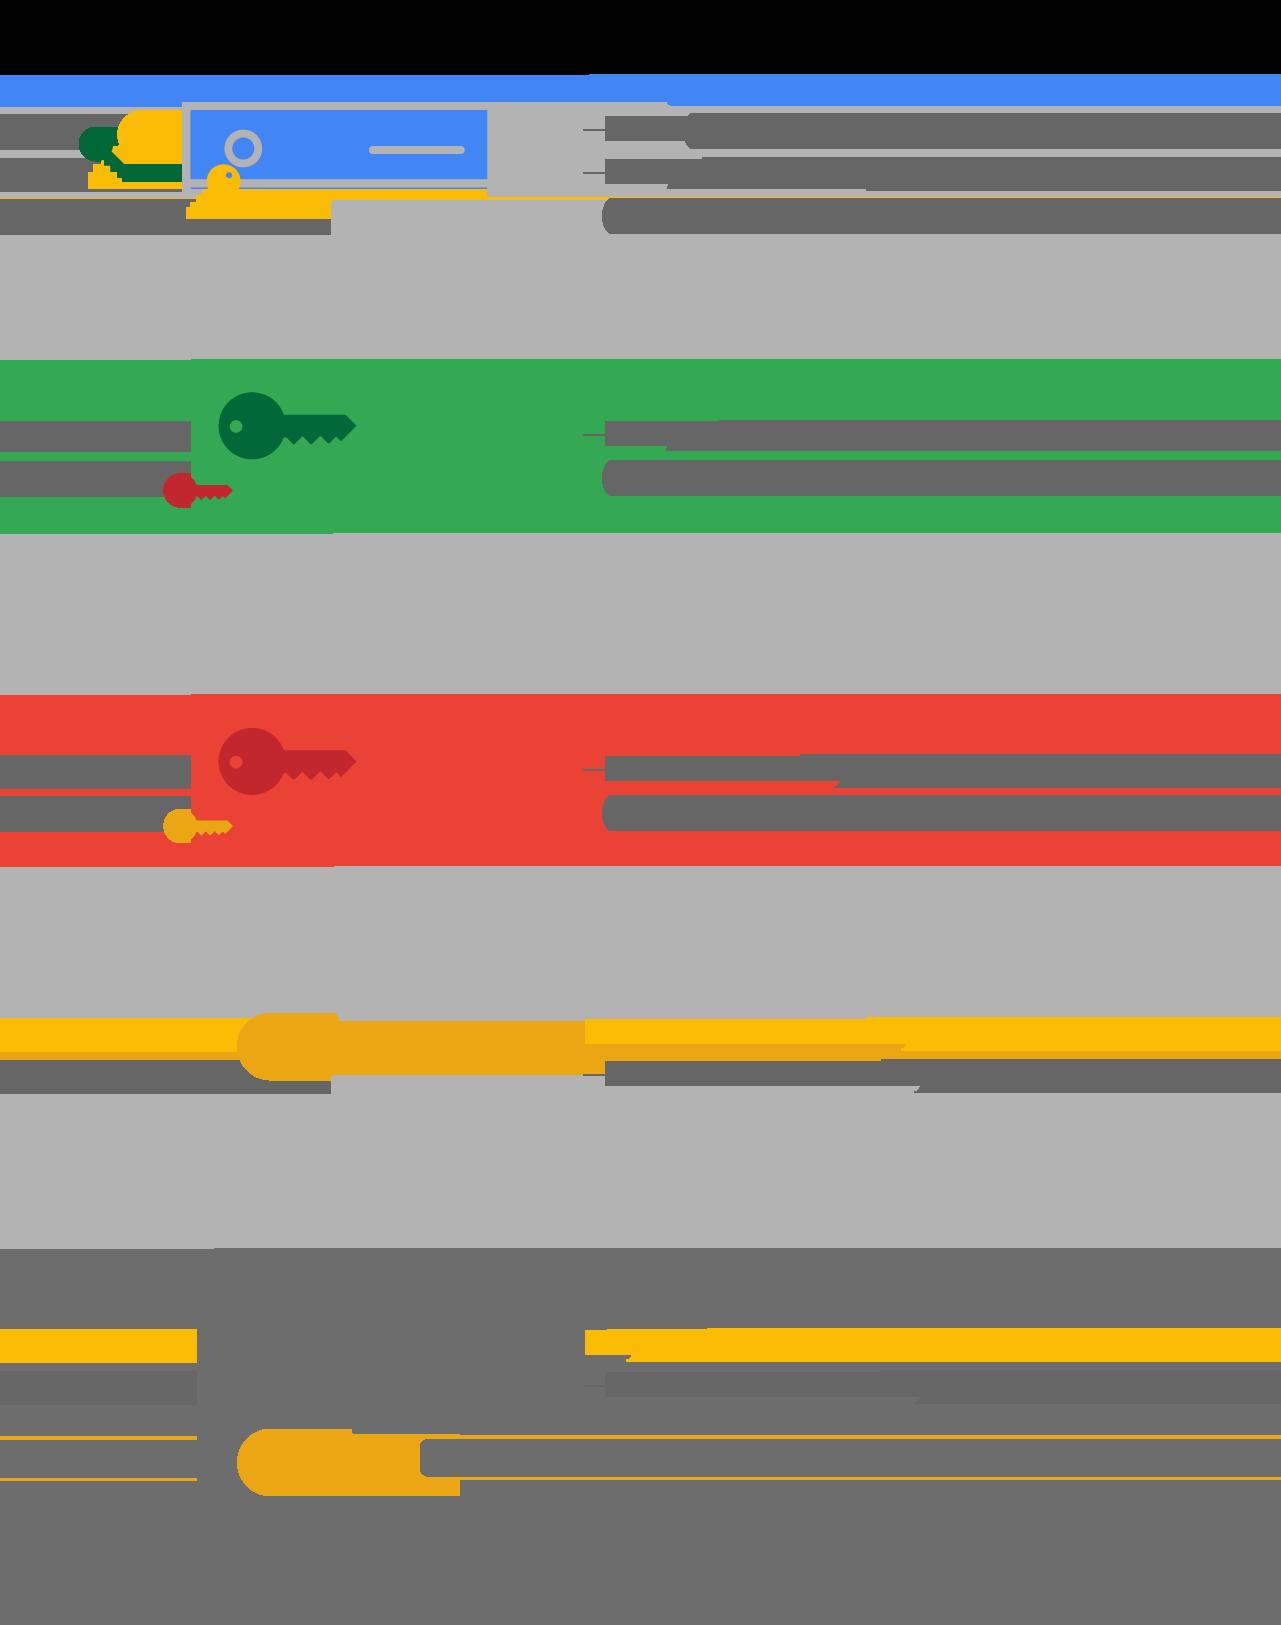 Diagrama da hierarquia de criptografia do Google